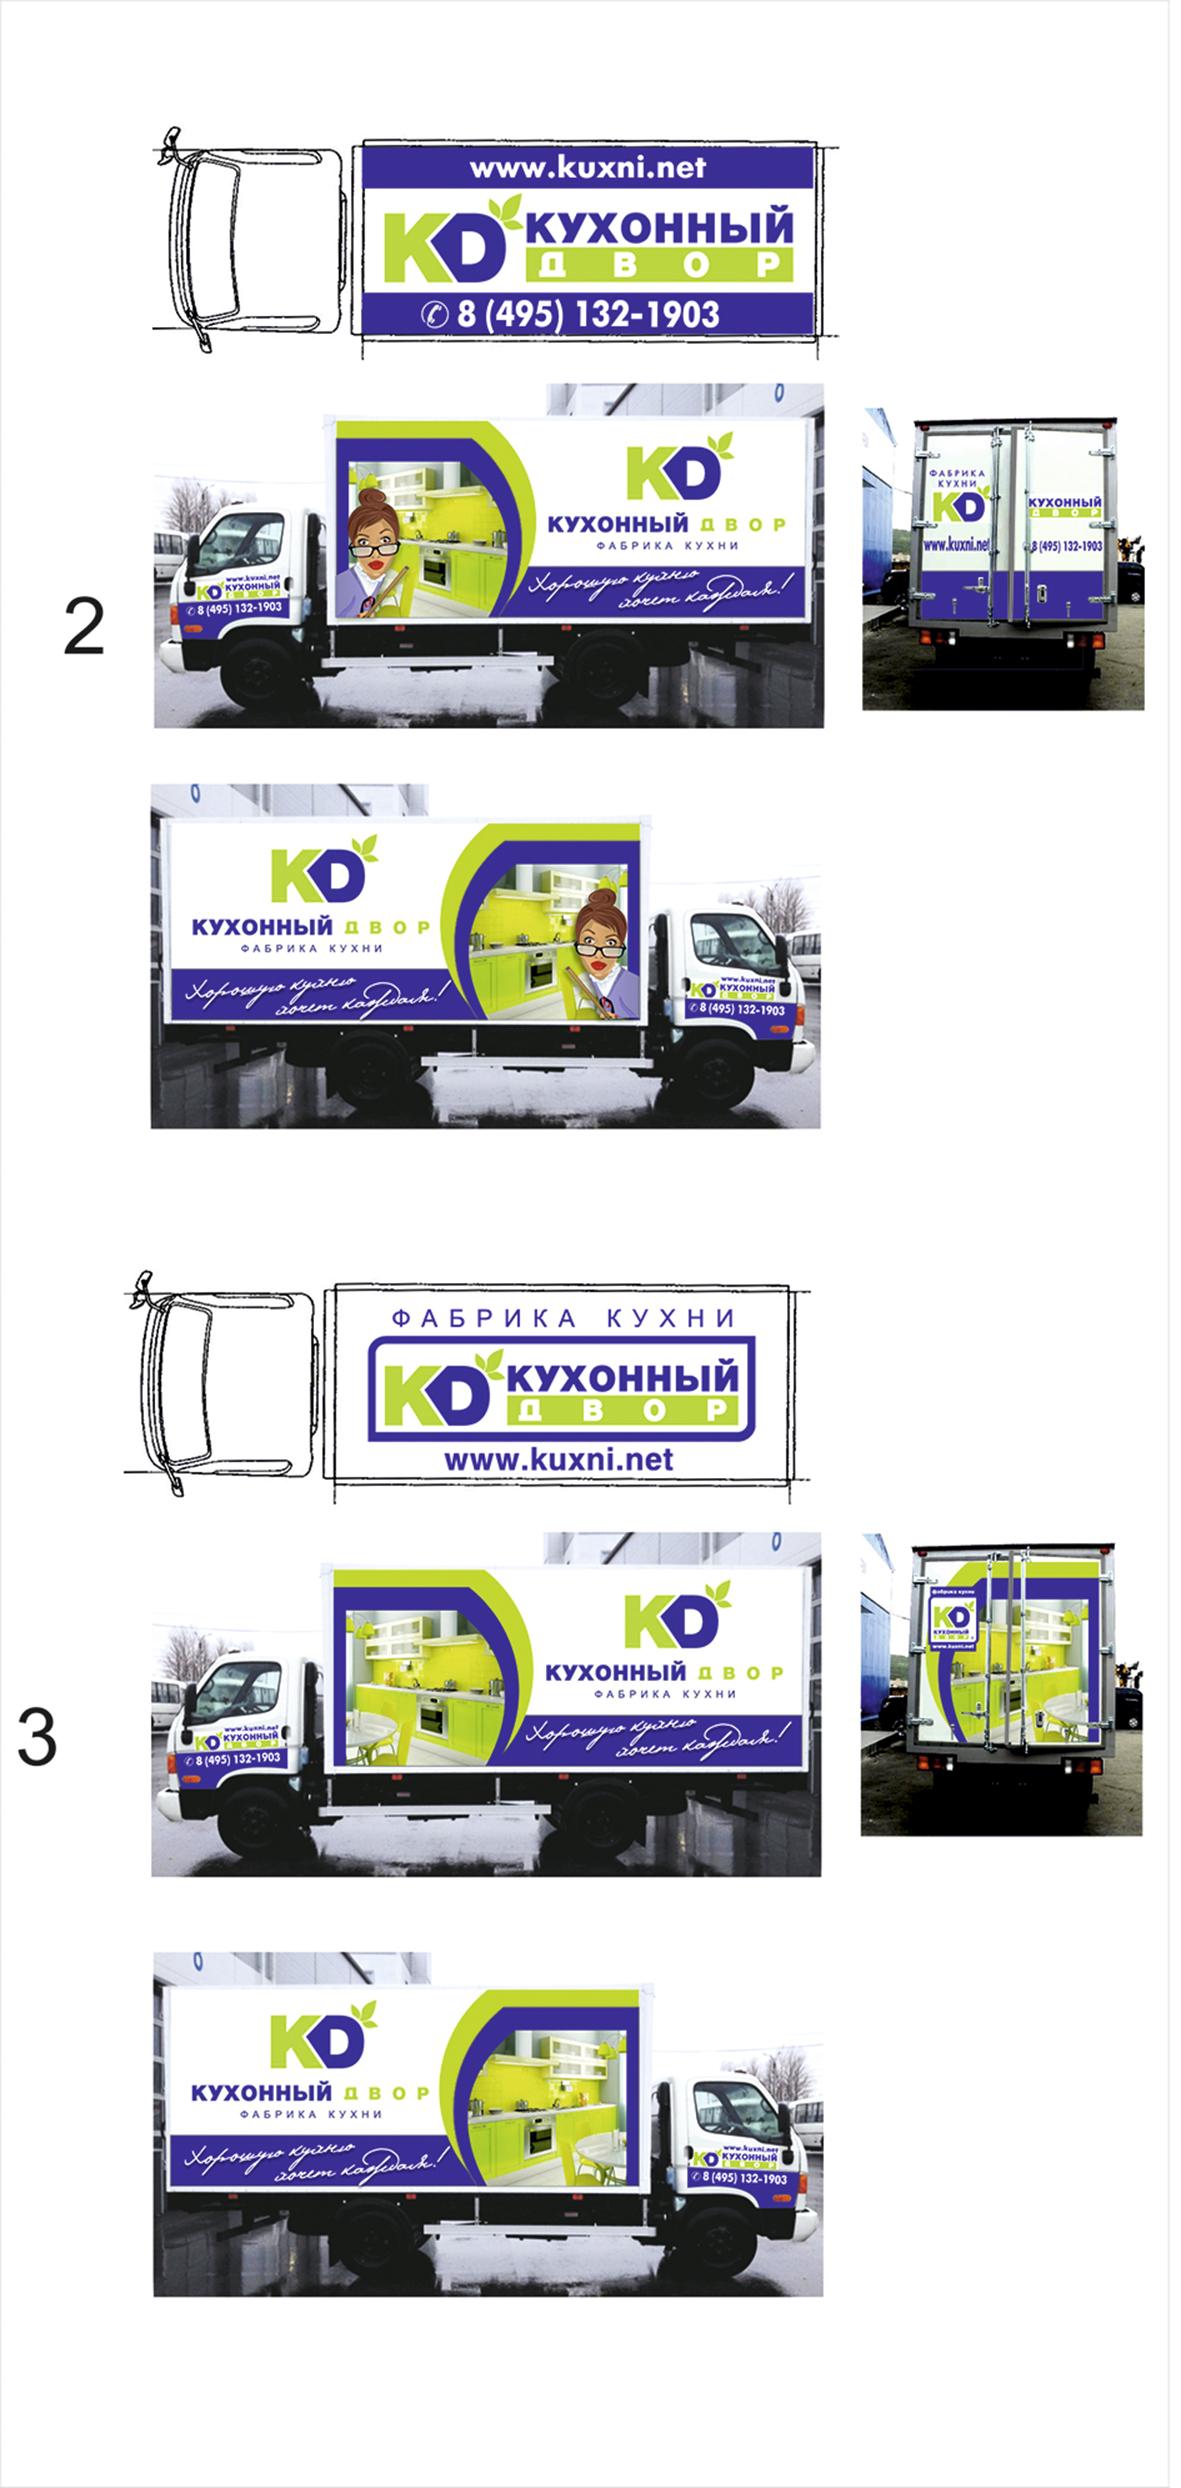 "Брендирование грузового авто для компании ""Кухонный двор"" фото f_28559cd59b553f6d.jpg"